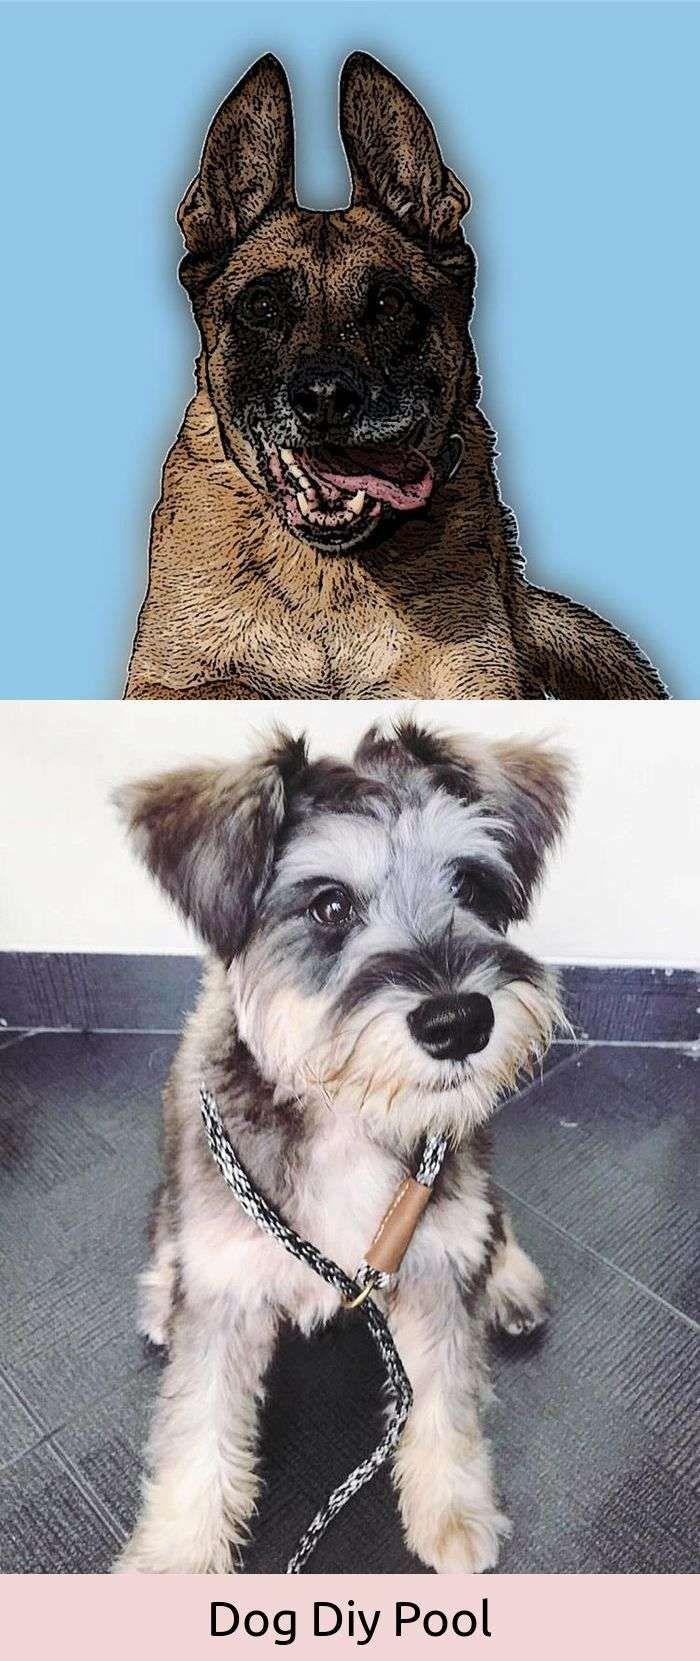 Funny dog jokes meme dogs hacks pinterest dogs dog hacks and